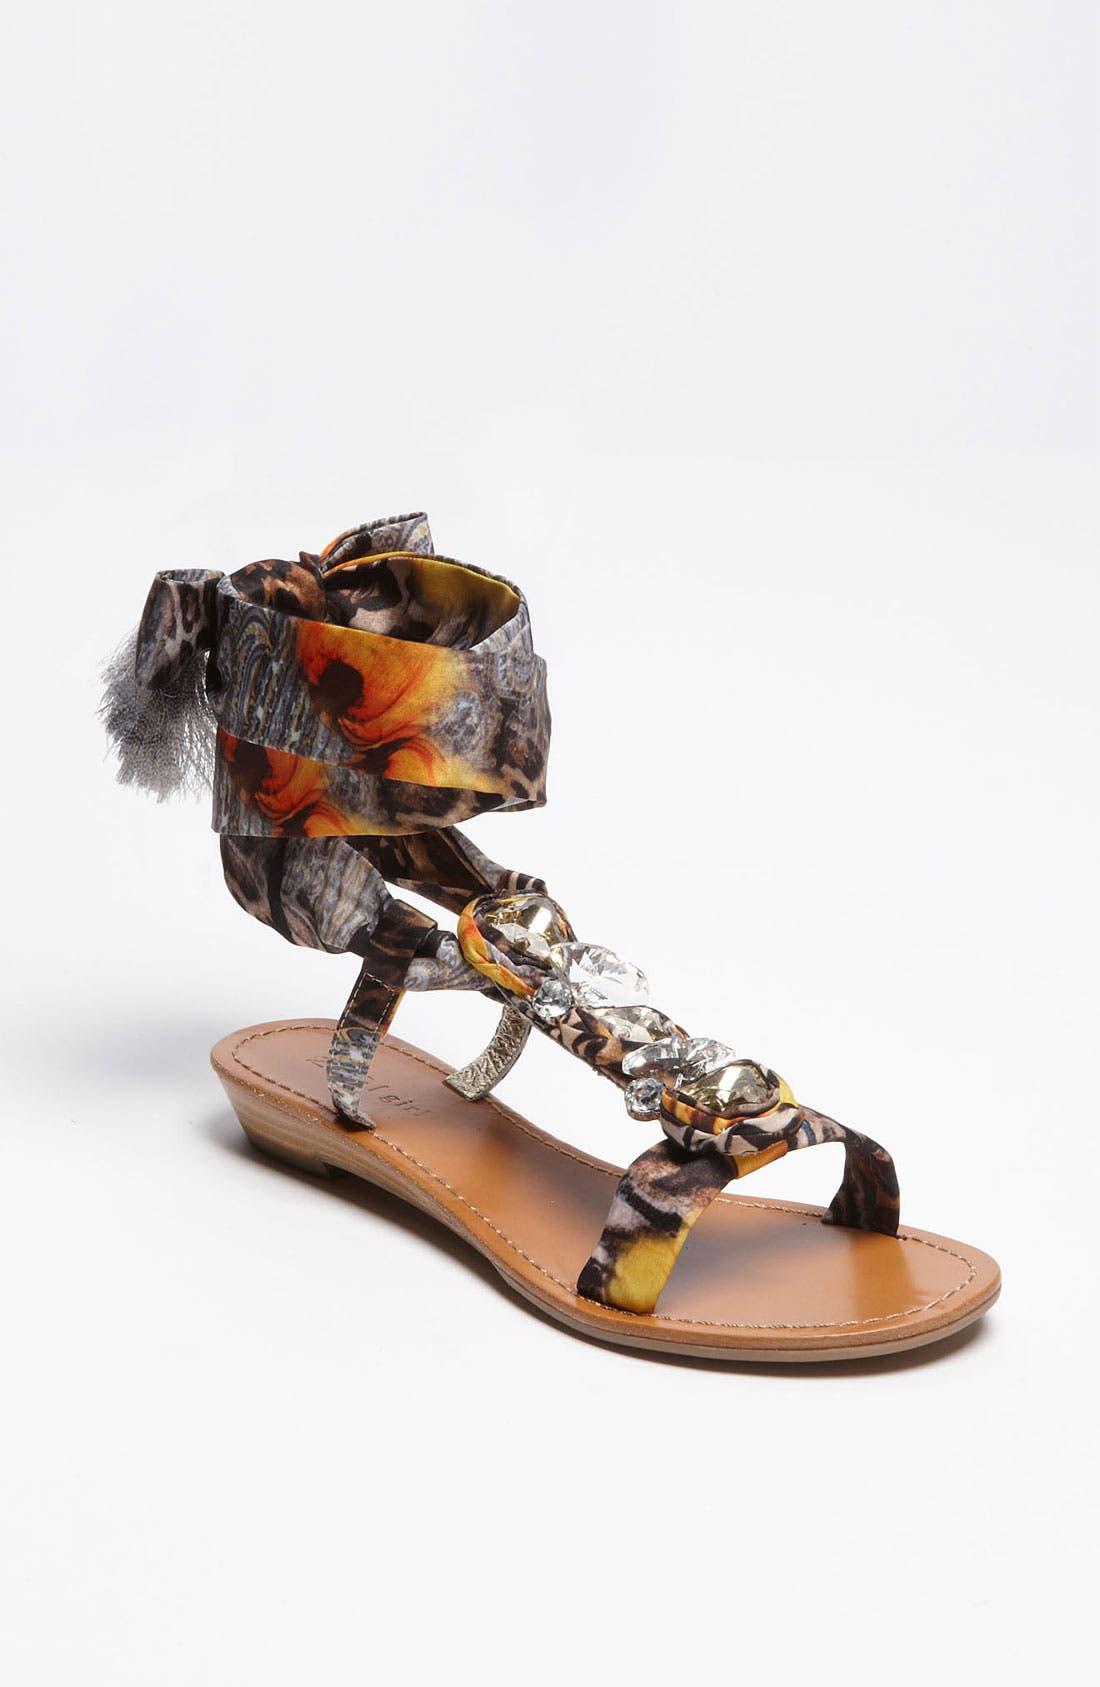 Alternate Image 1 Selected - ZiGi girl 'Myriad' Sandal